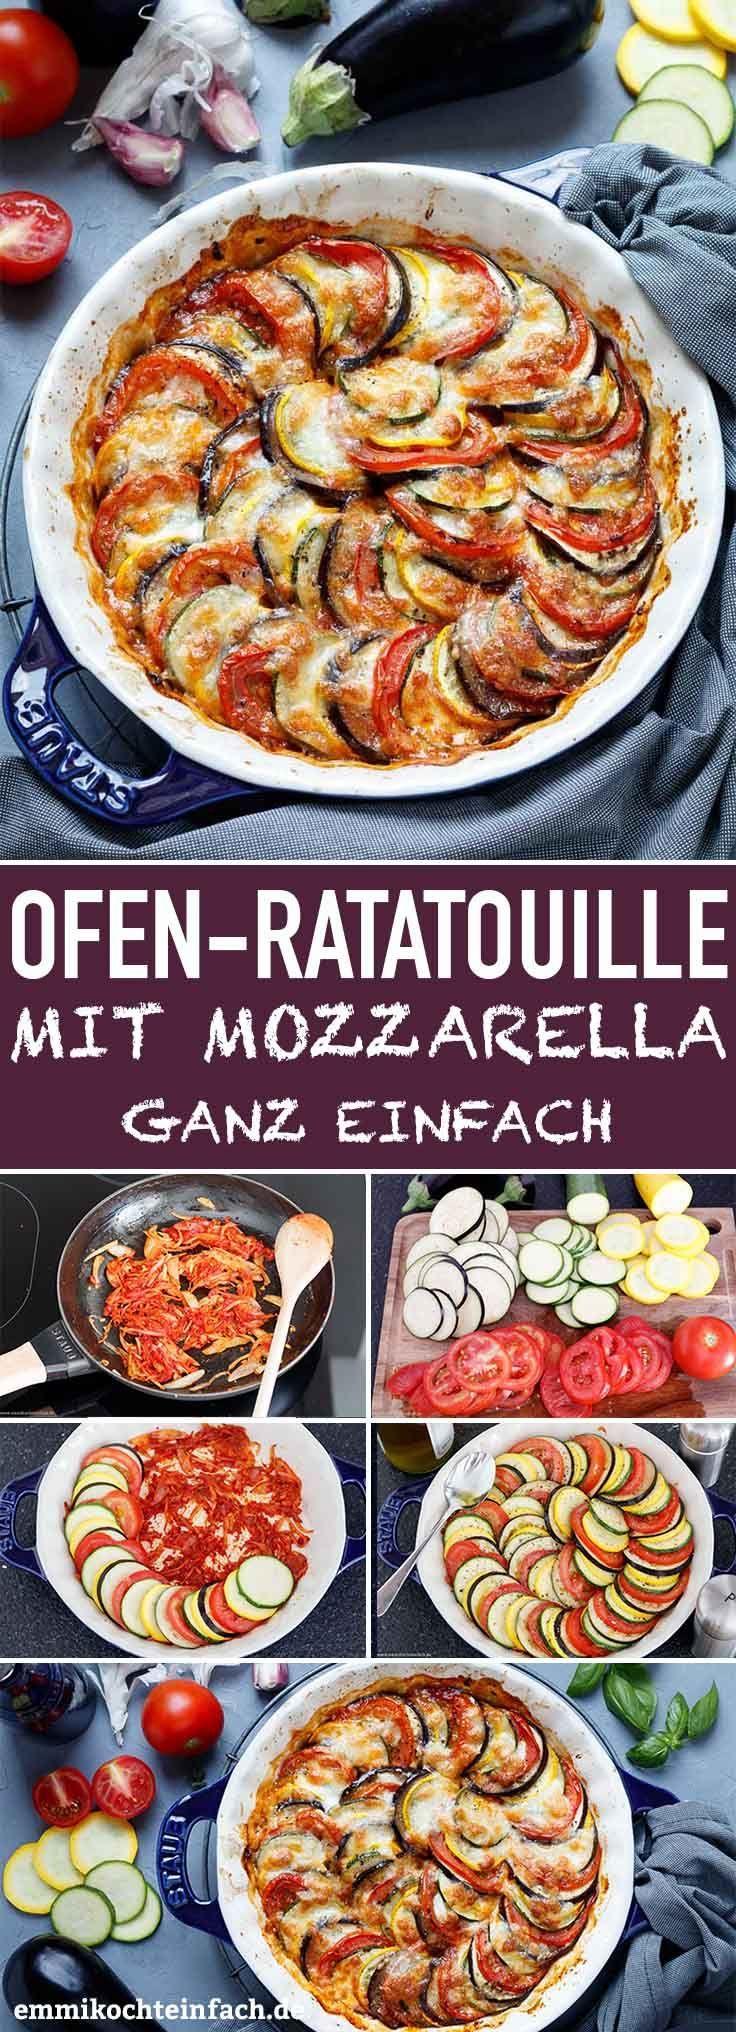 Ratatouille aus dem Ofen mit Mozzarella – BakingLifeStories – Foodblog